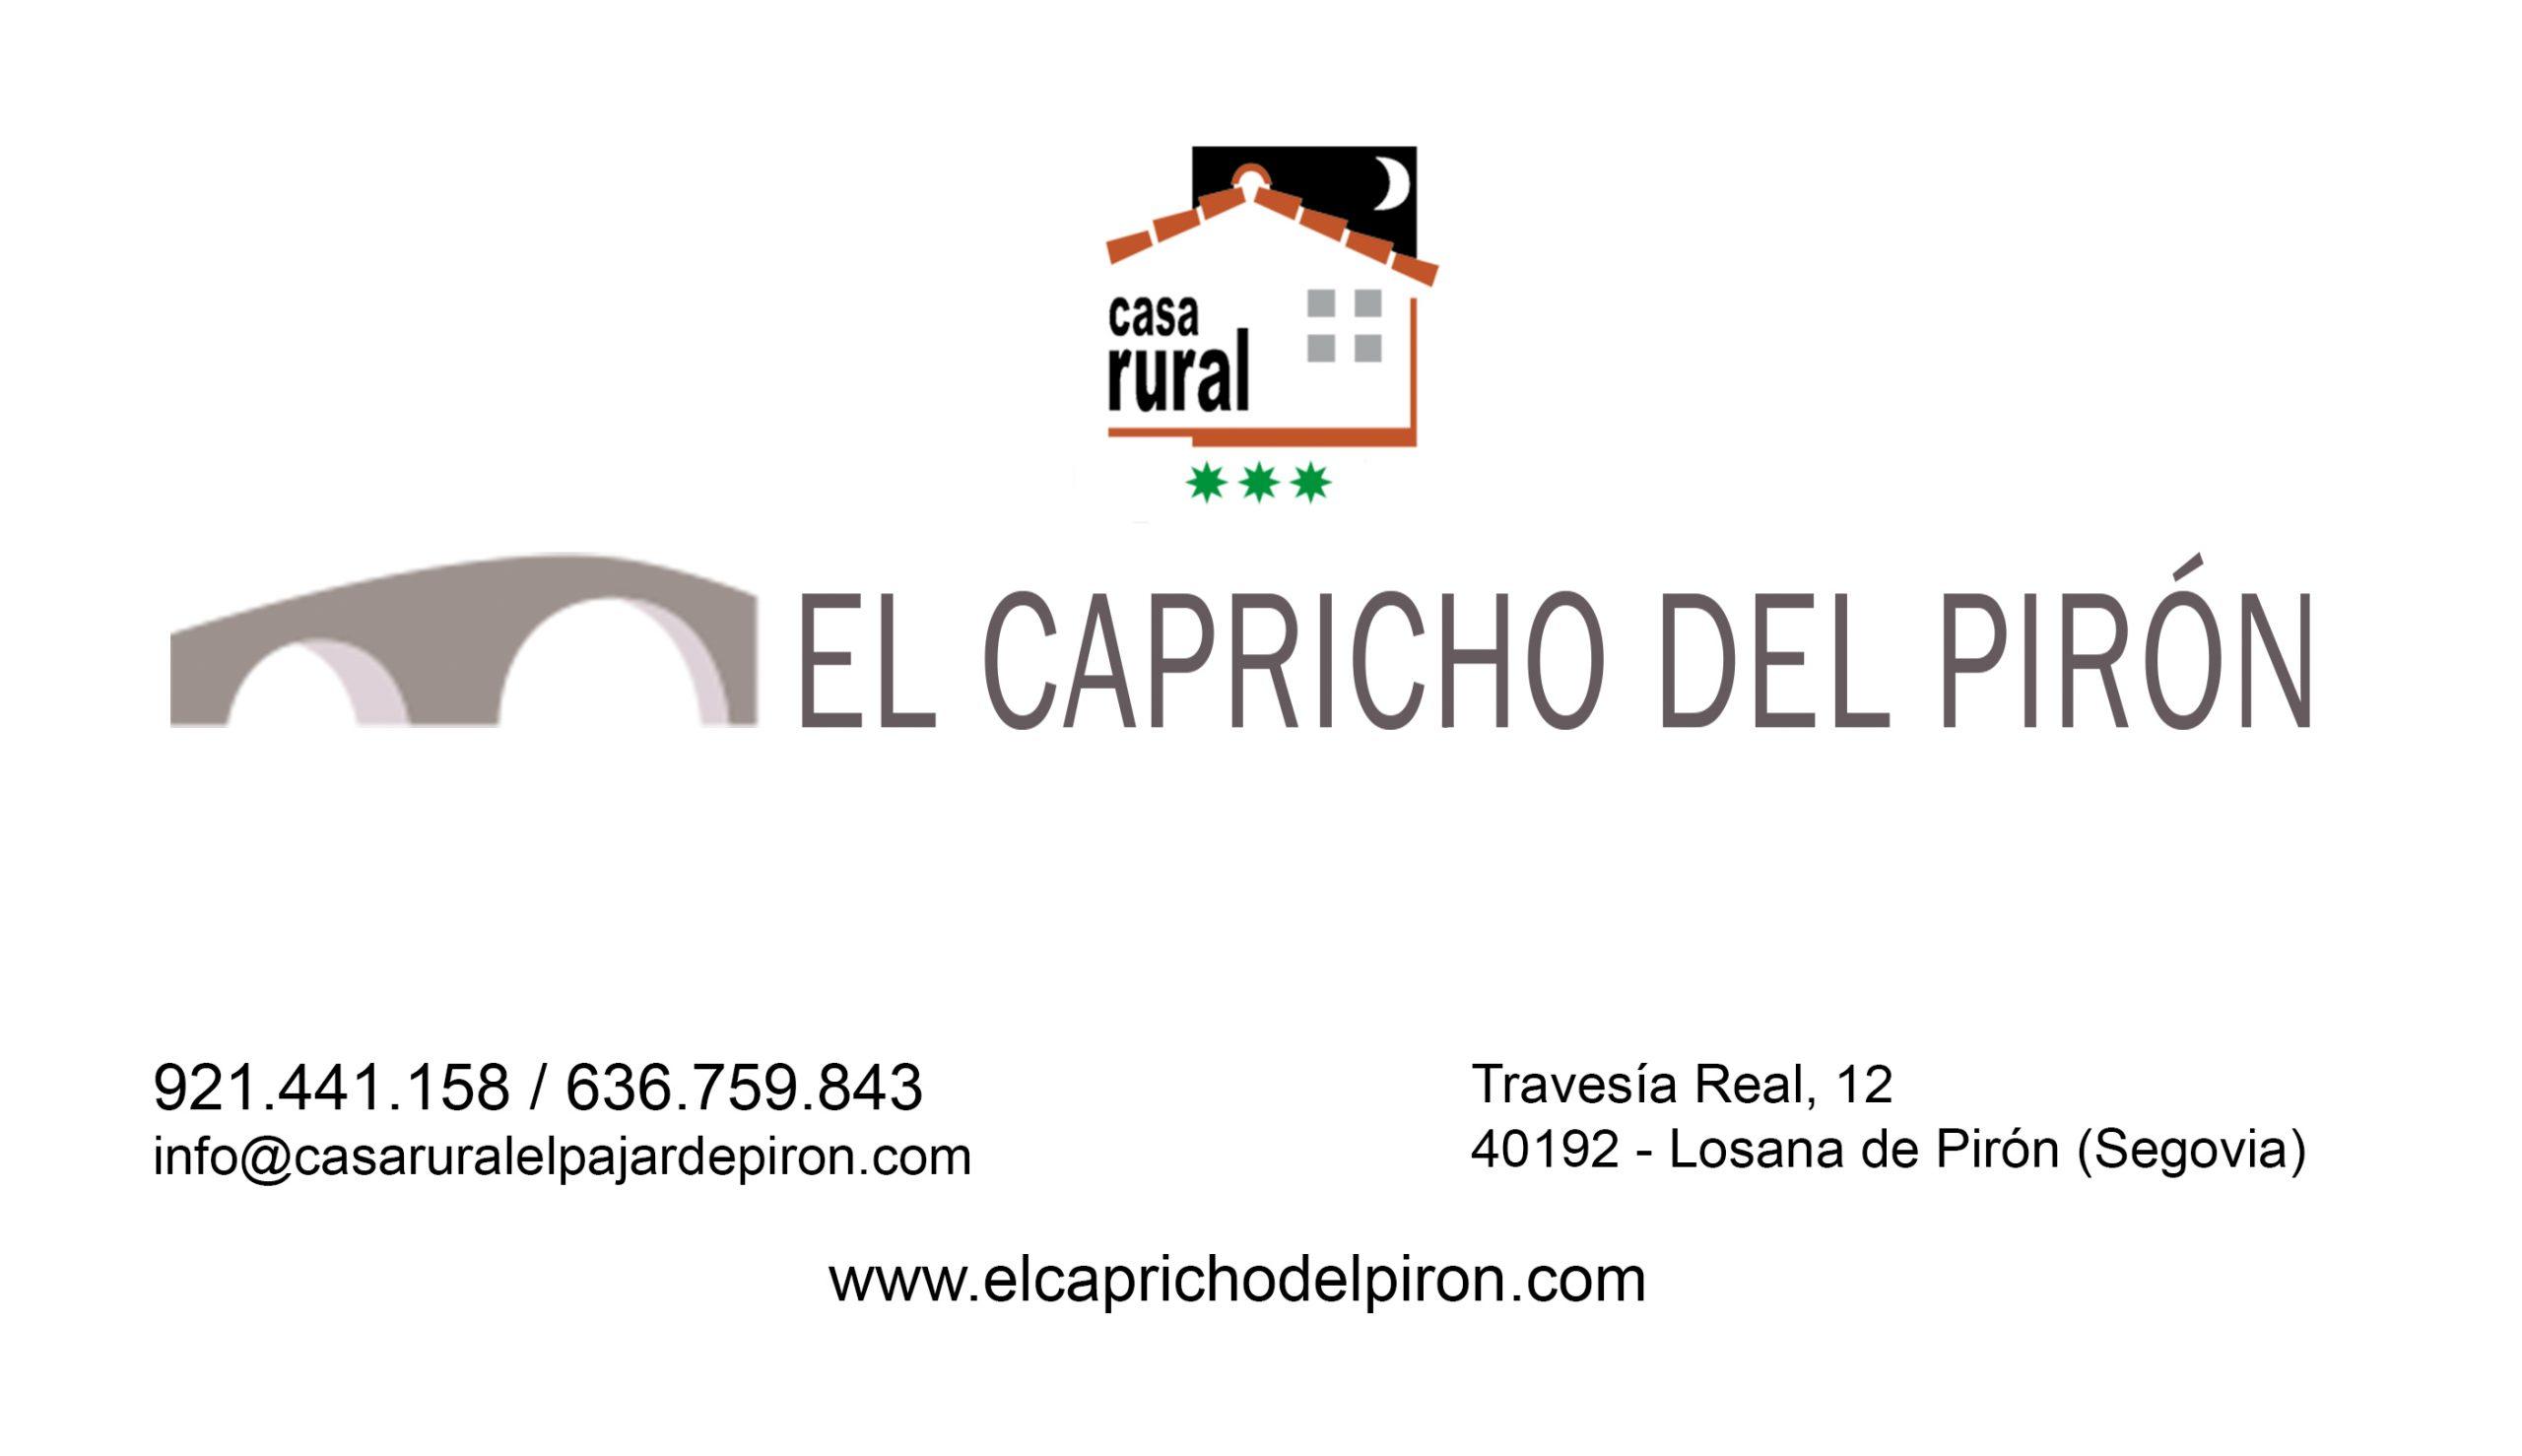 11-El_Capricho_del_Piron